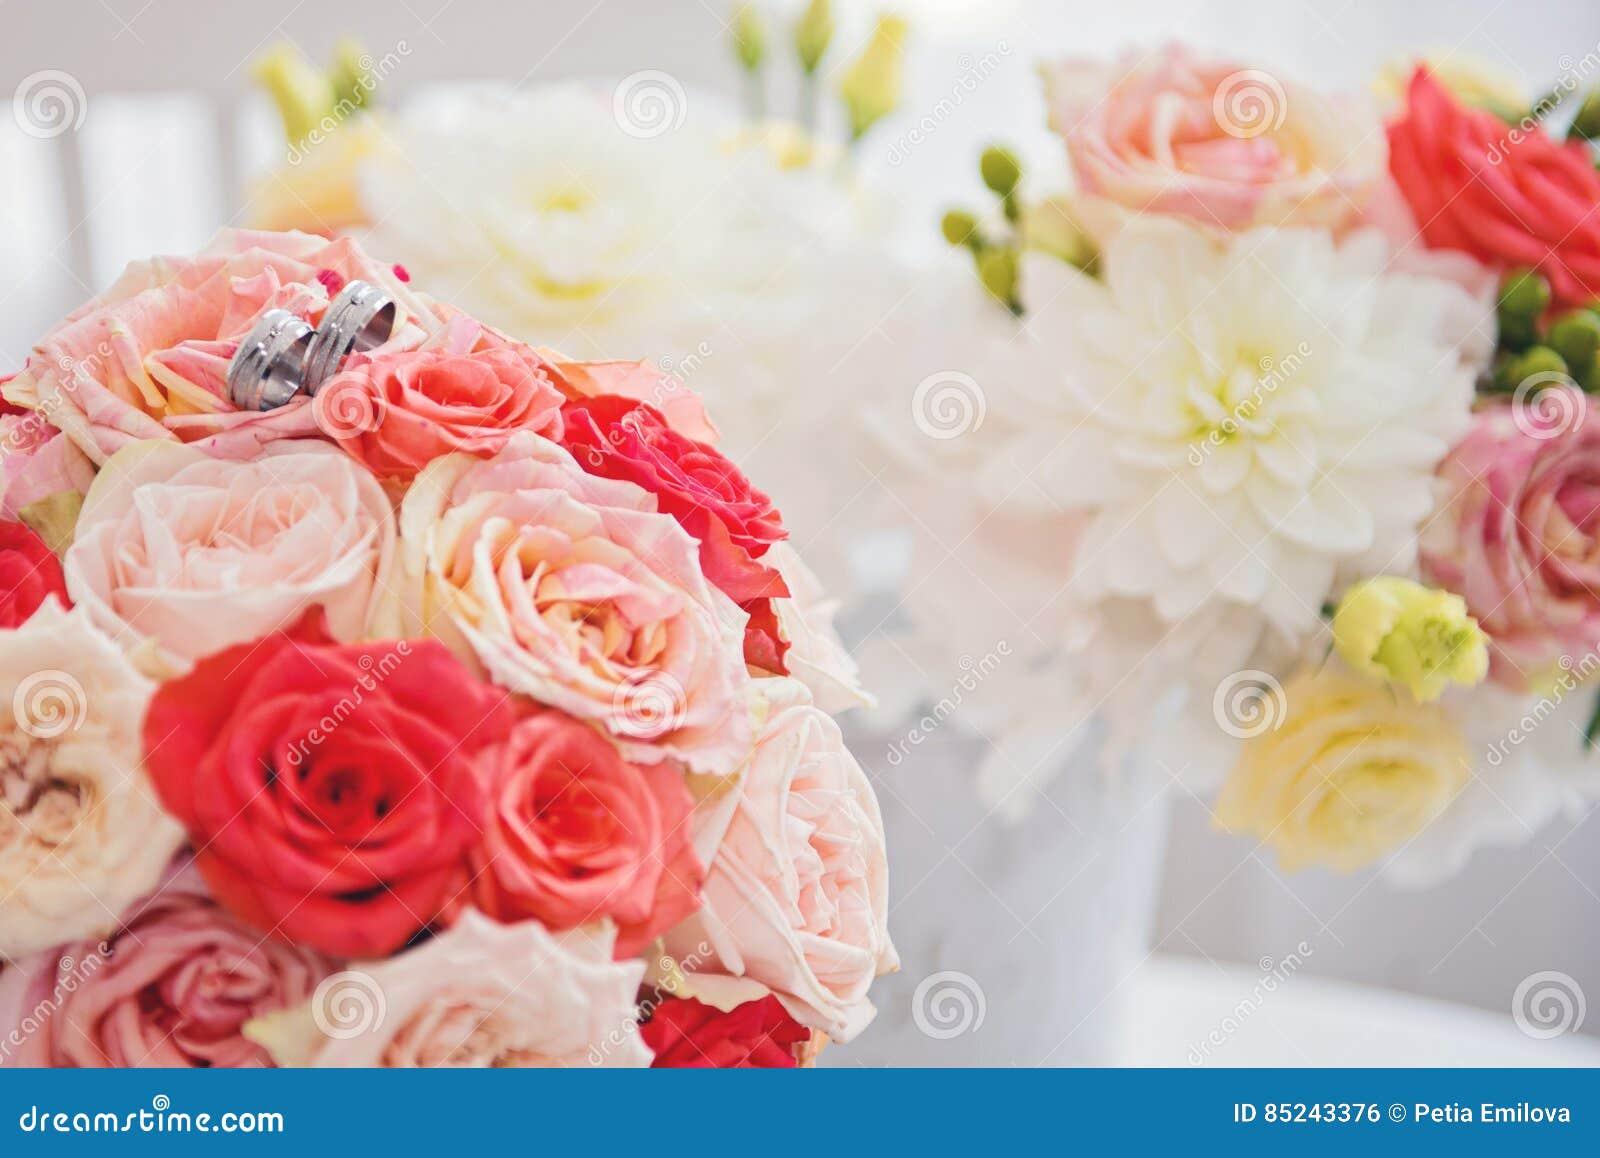 White Shoe Of The Bride Wedding Theme Background Stock Photo